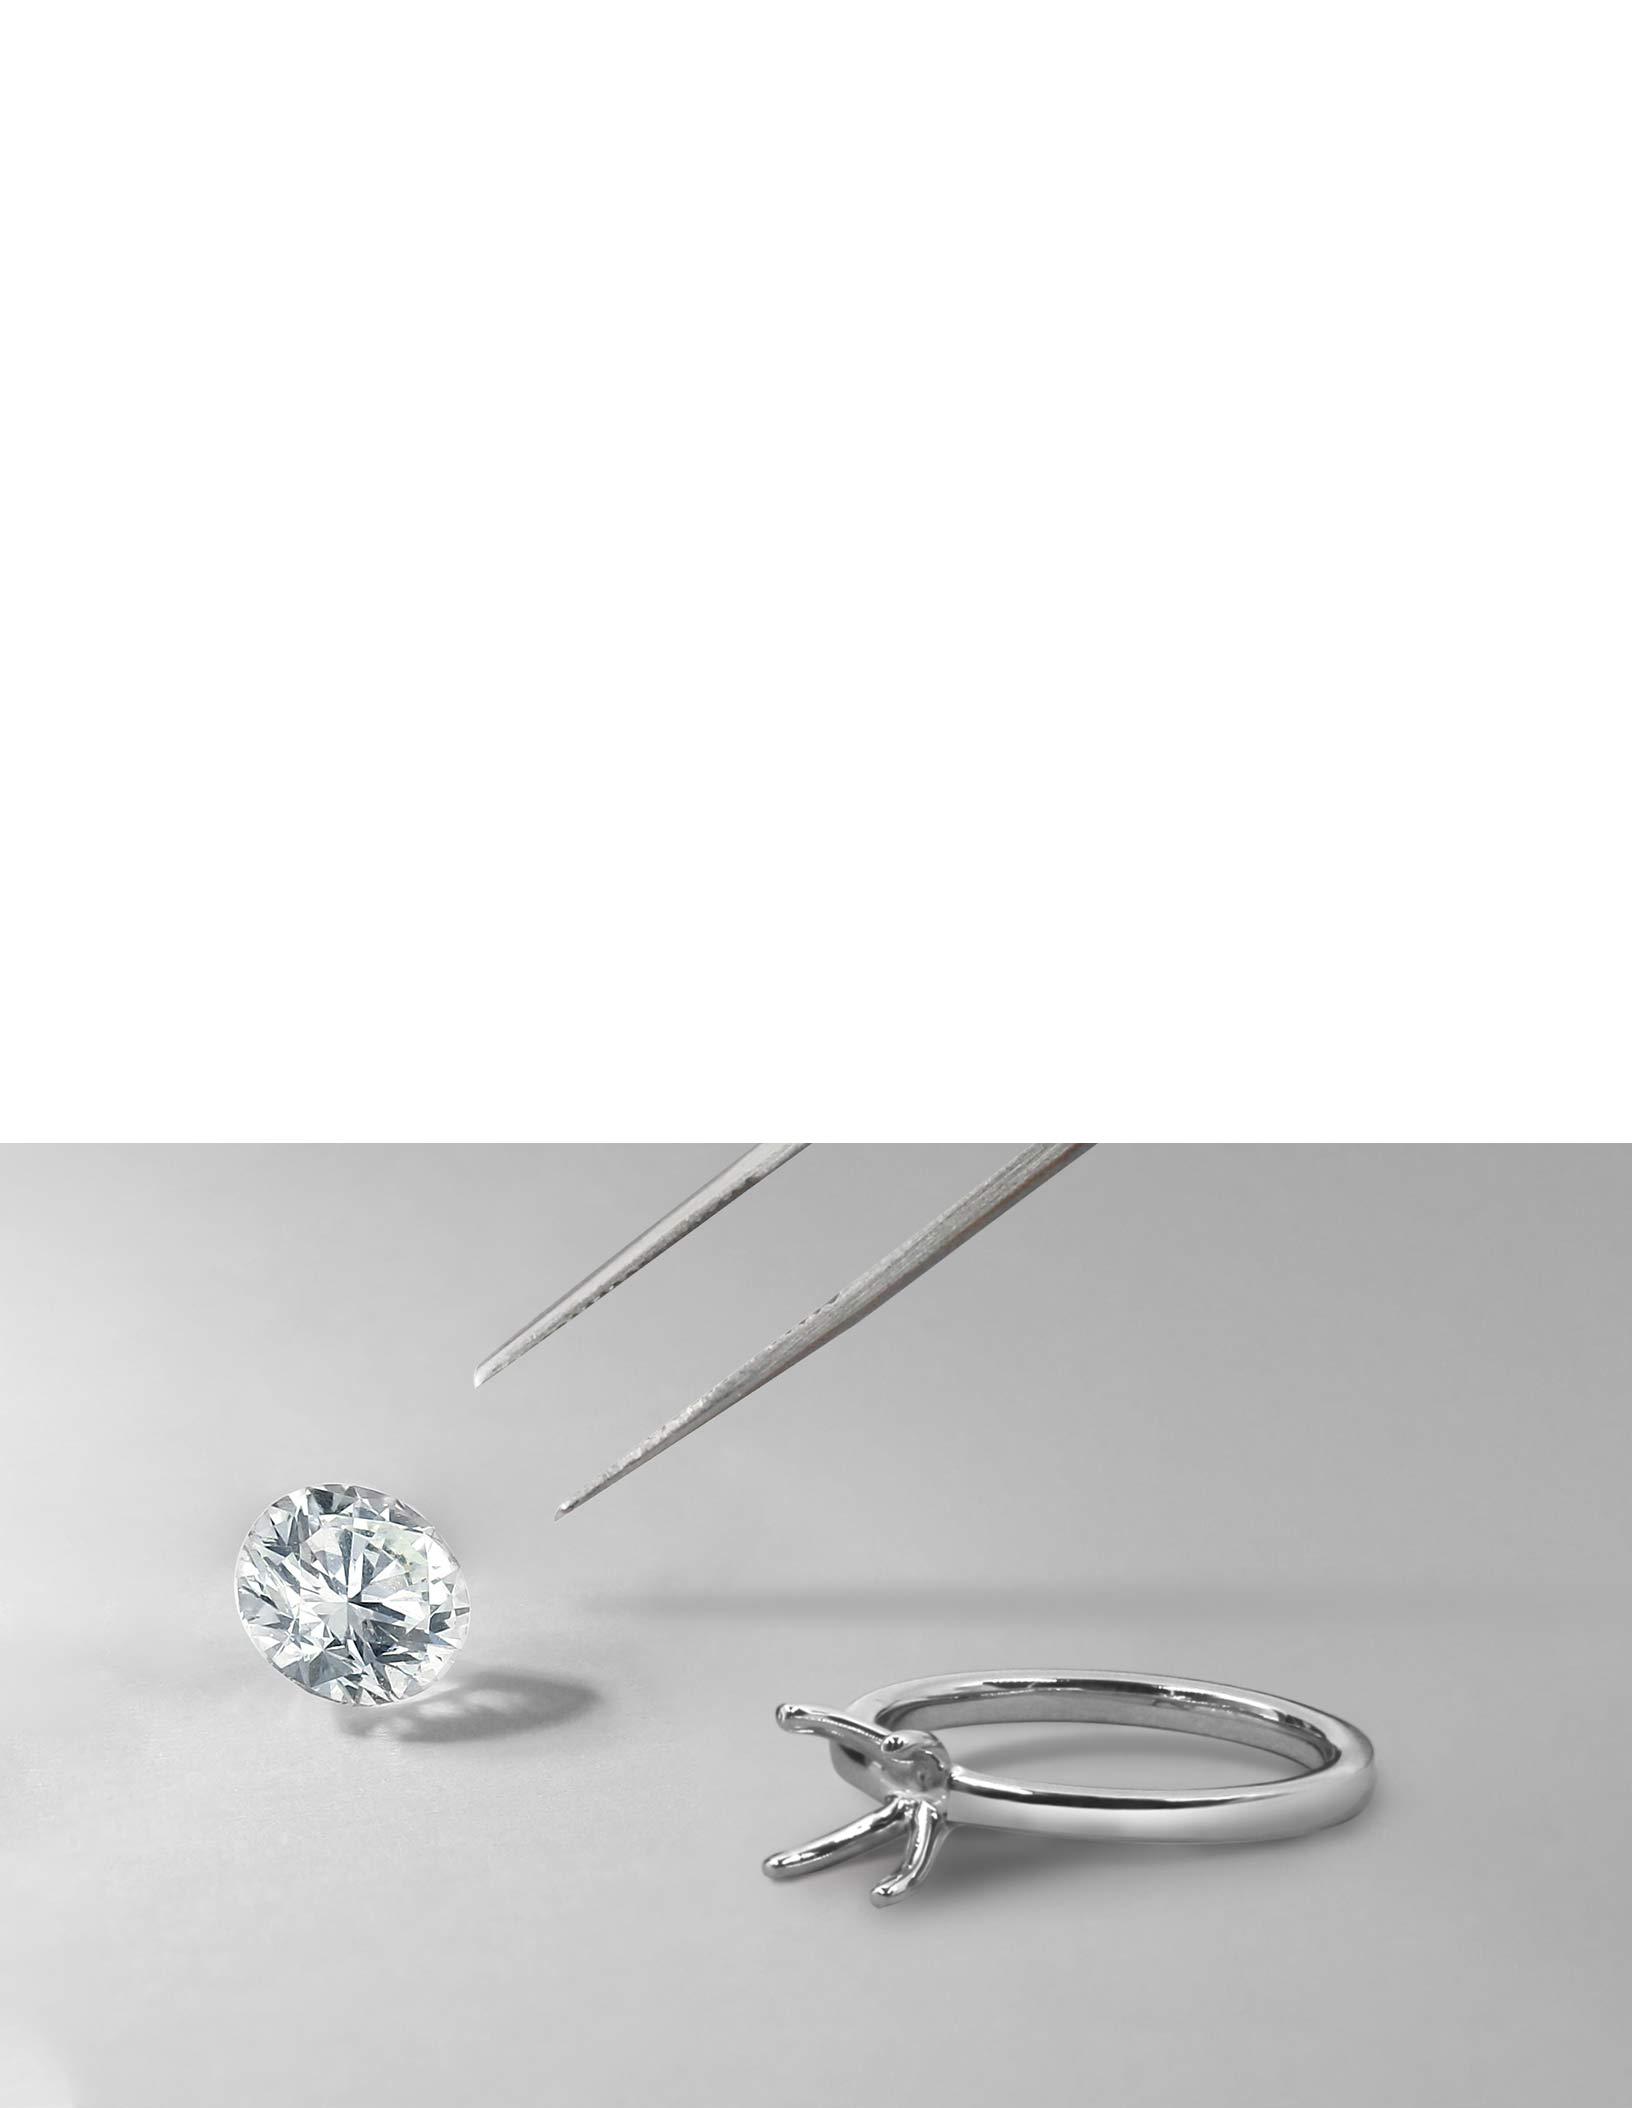 Pear Shaped Engagement Rings - Steven Stone